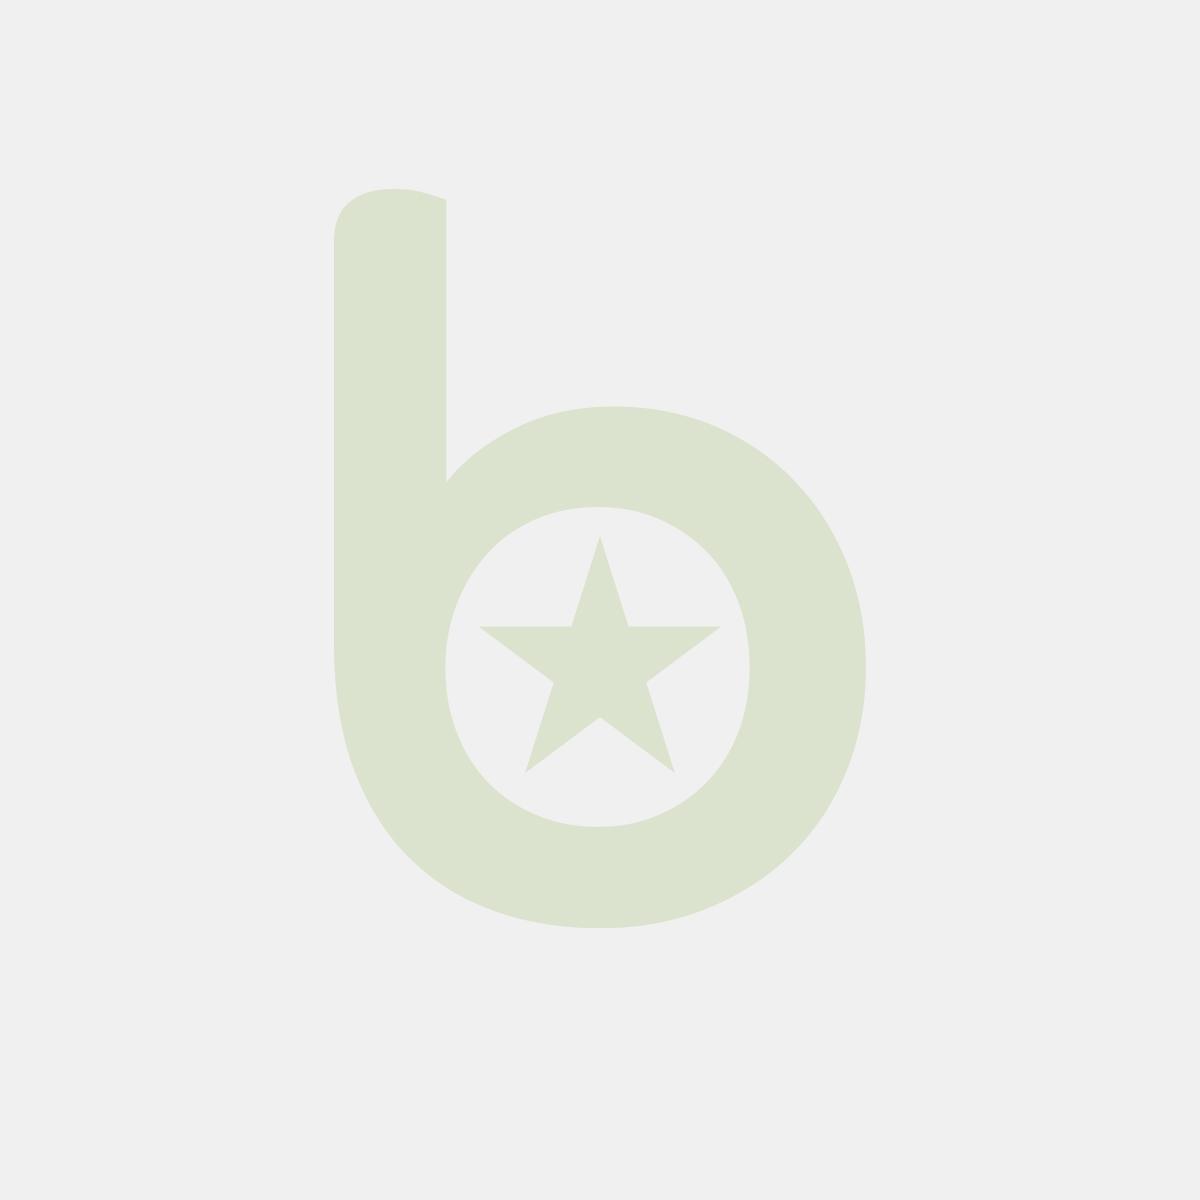 SL 907SBL sosjerka czarna 50ml opakowanie 84szt